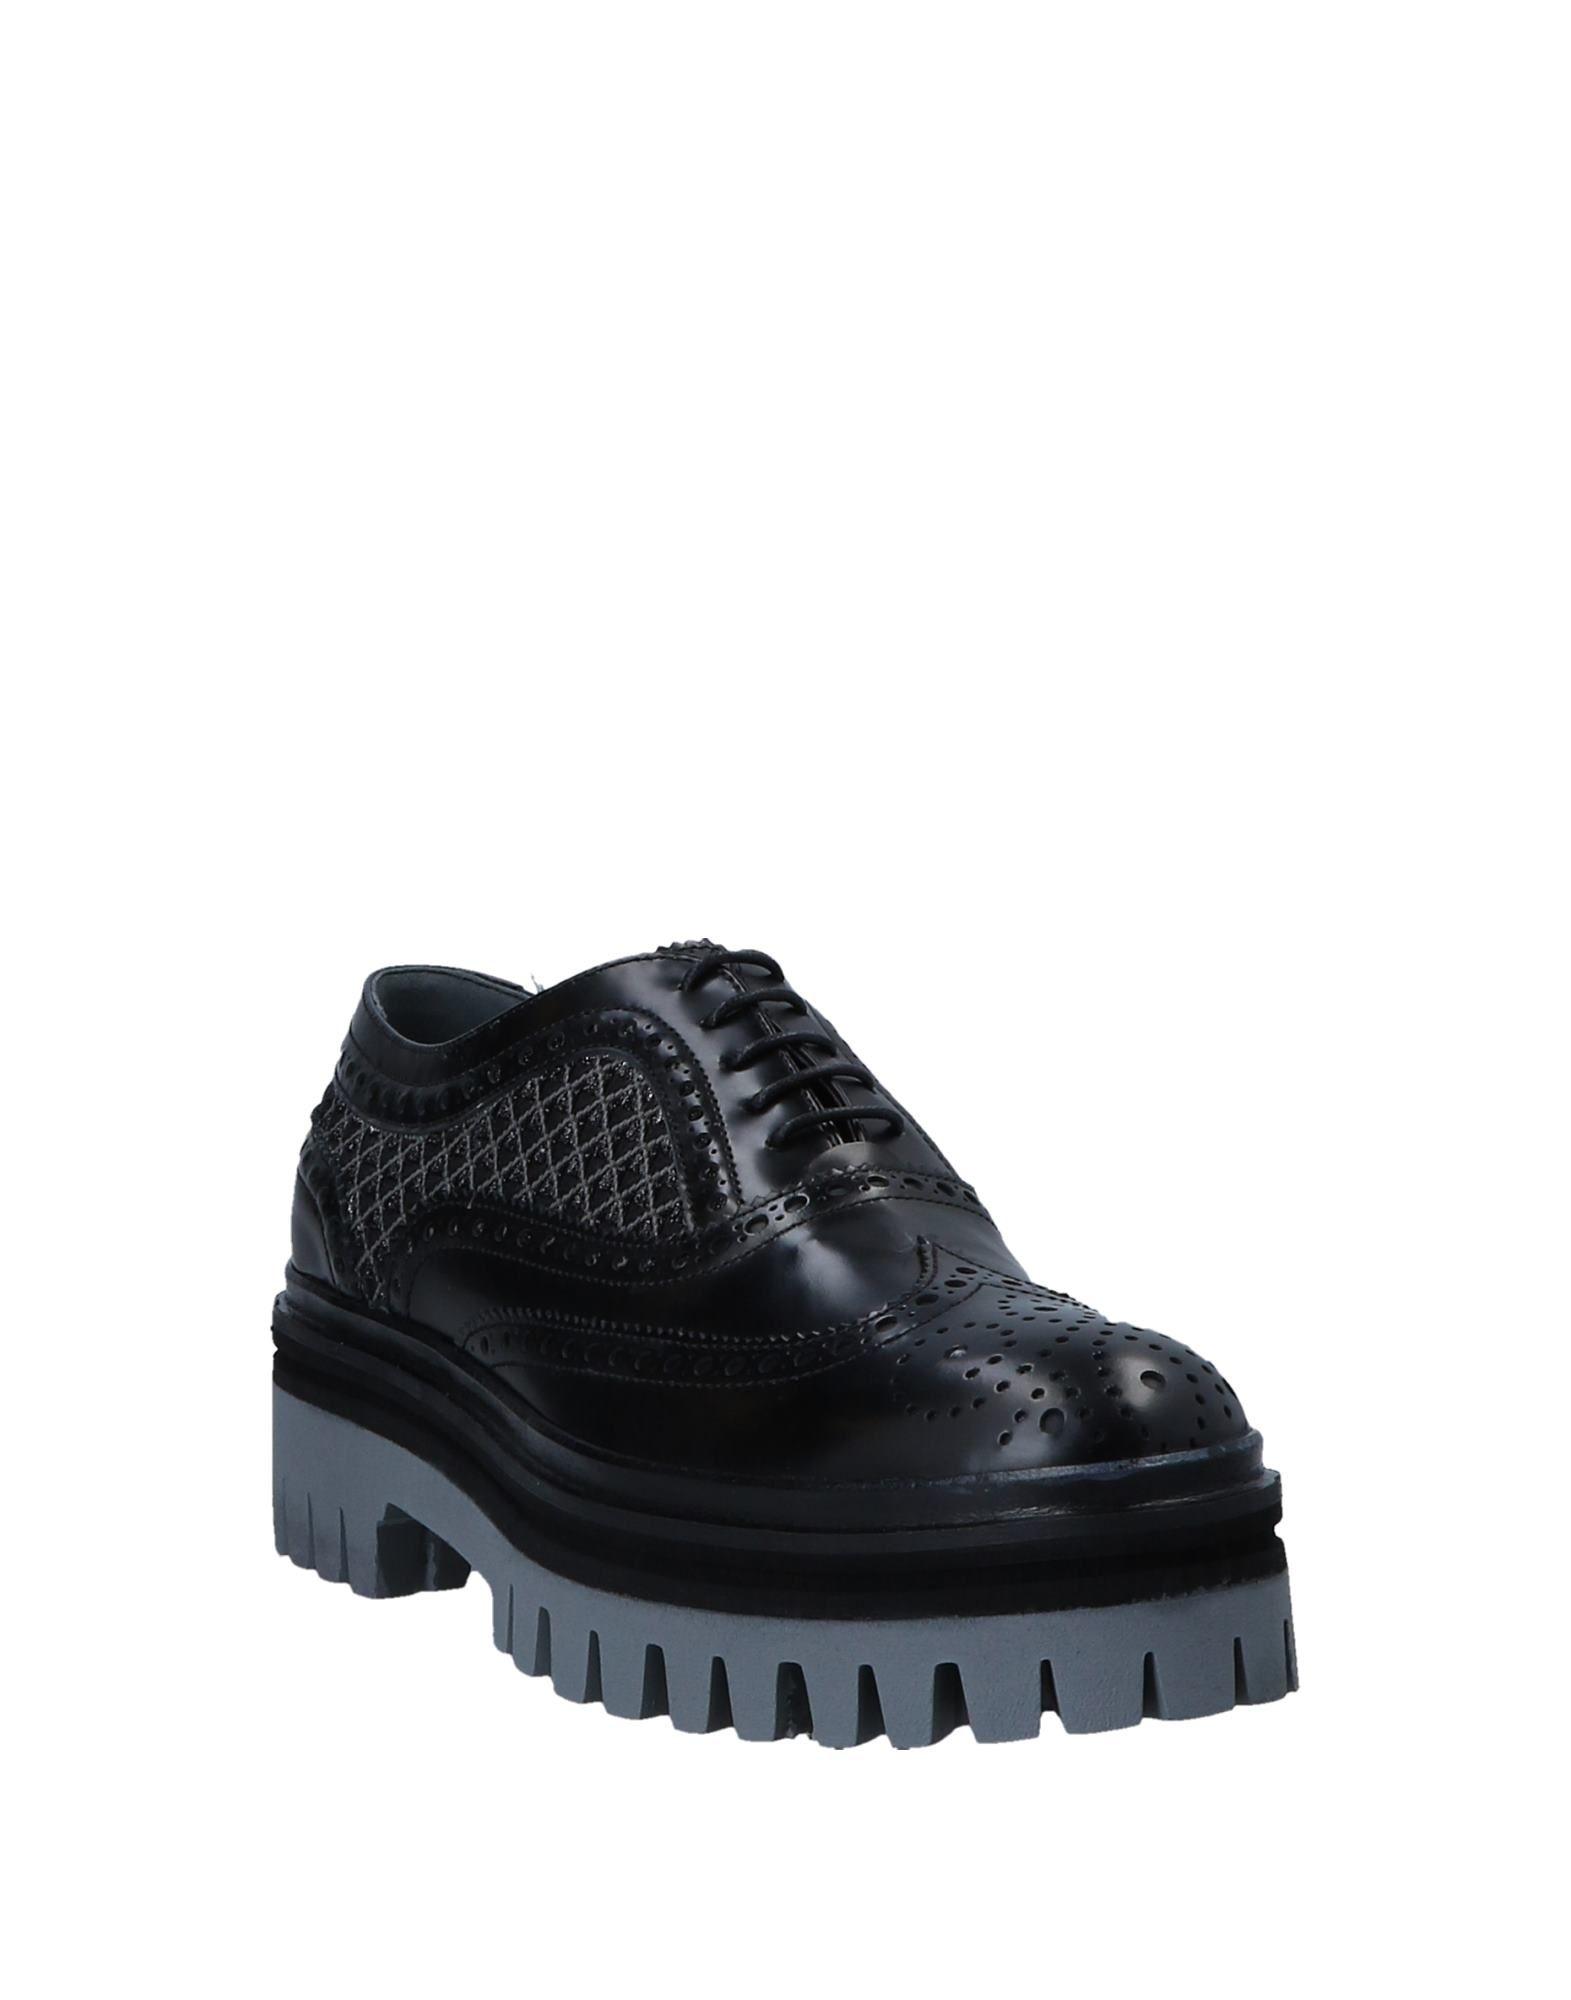 Alberto Guardiani Schnürschuhe Damen Schuhe  11560931JXGut aussehende strapazierfähige Schuhe Damen b5288f